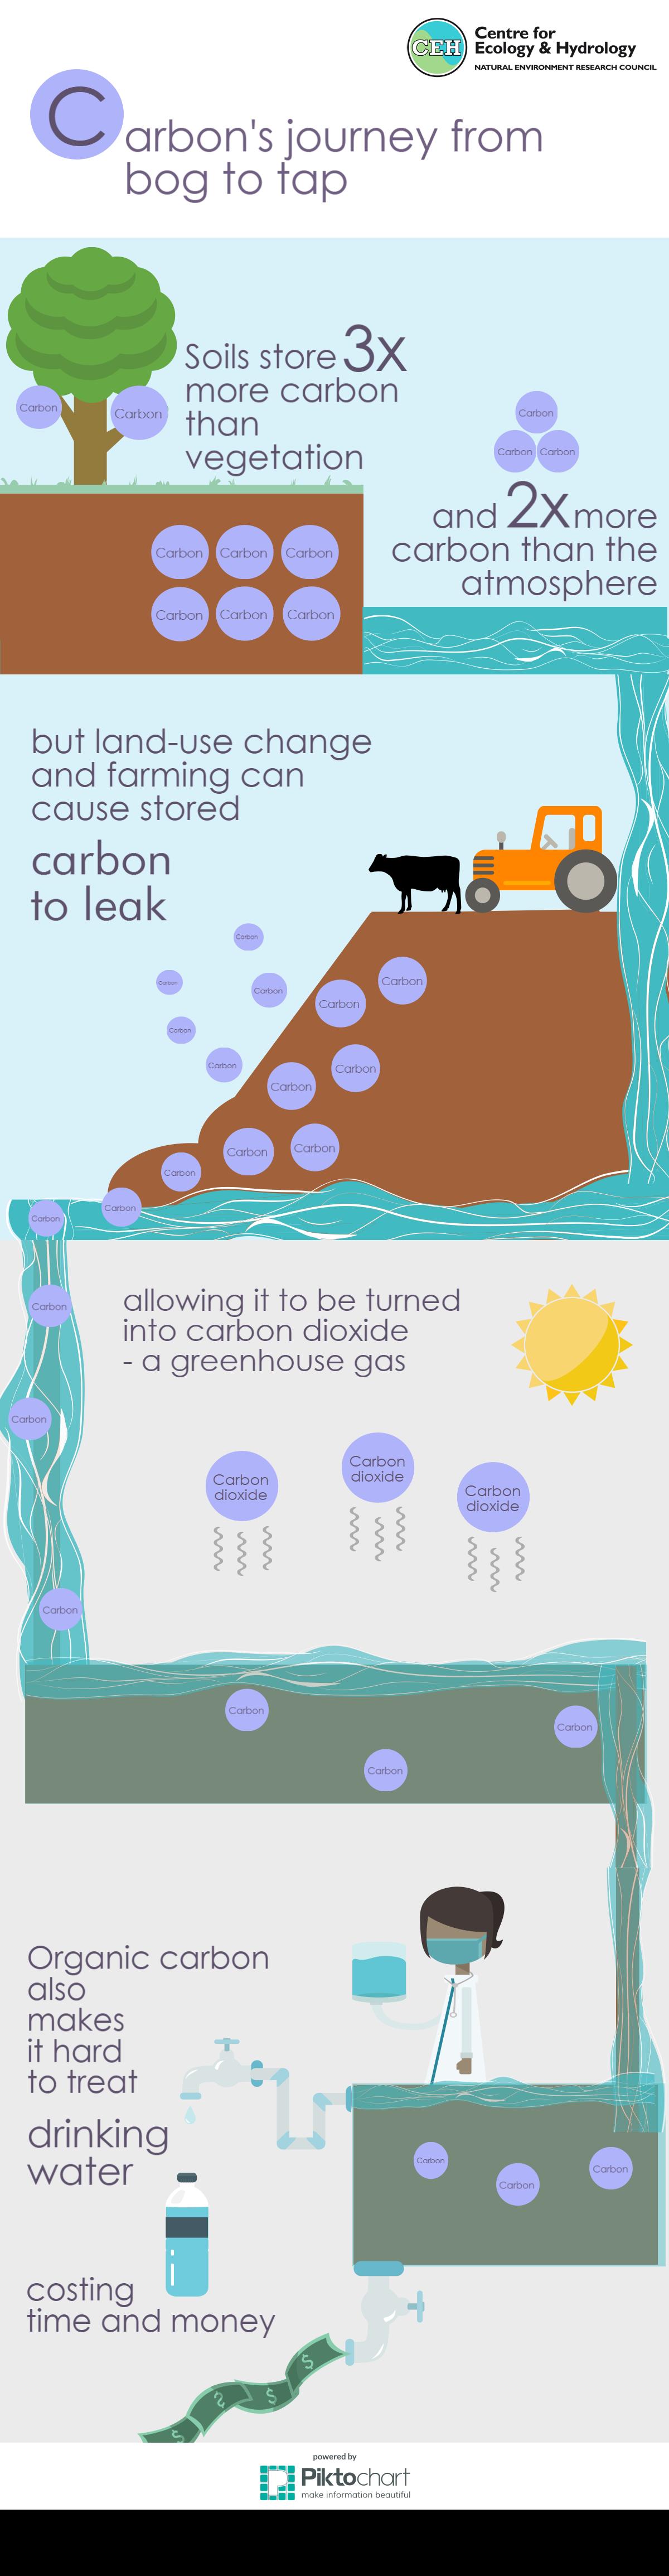 Chris Evans bog infographic